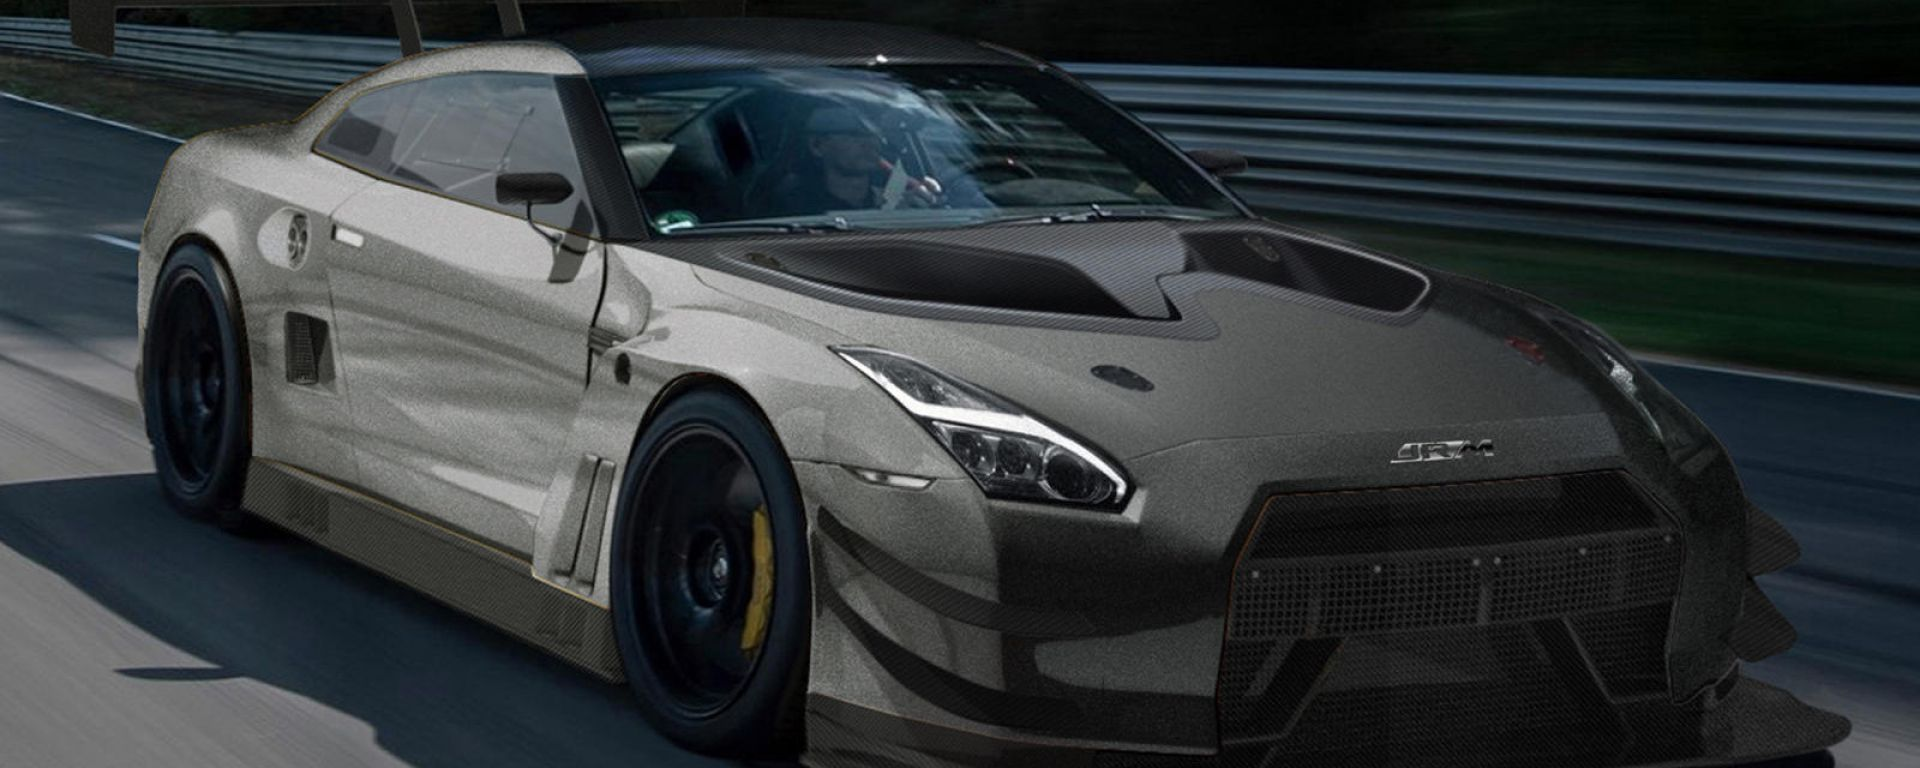 JRM GT23 è la Nissan GT-R da 760 CV in 23 esemplari